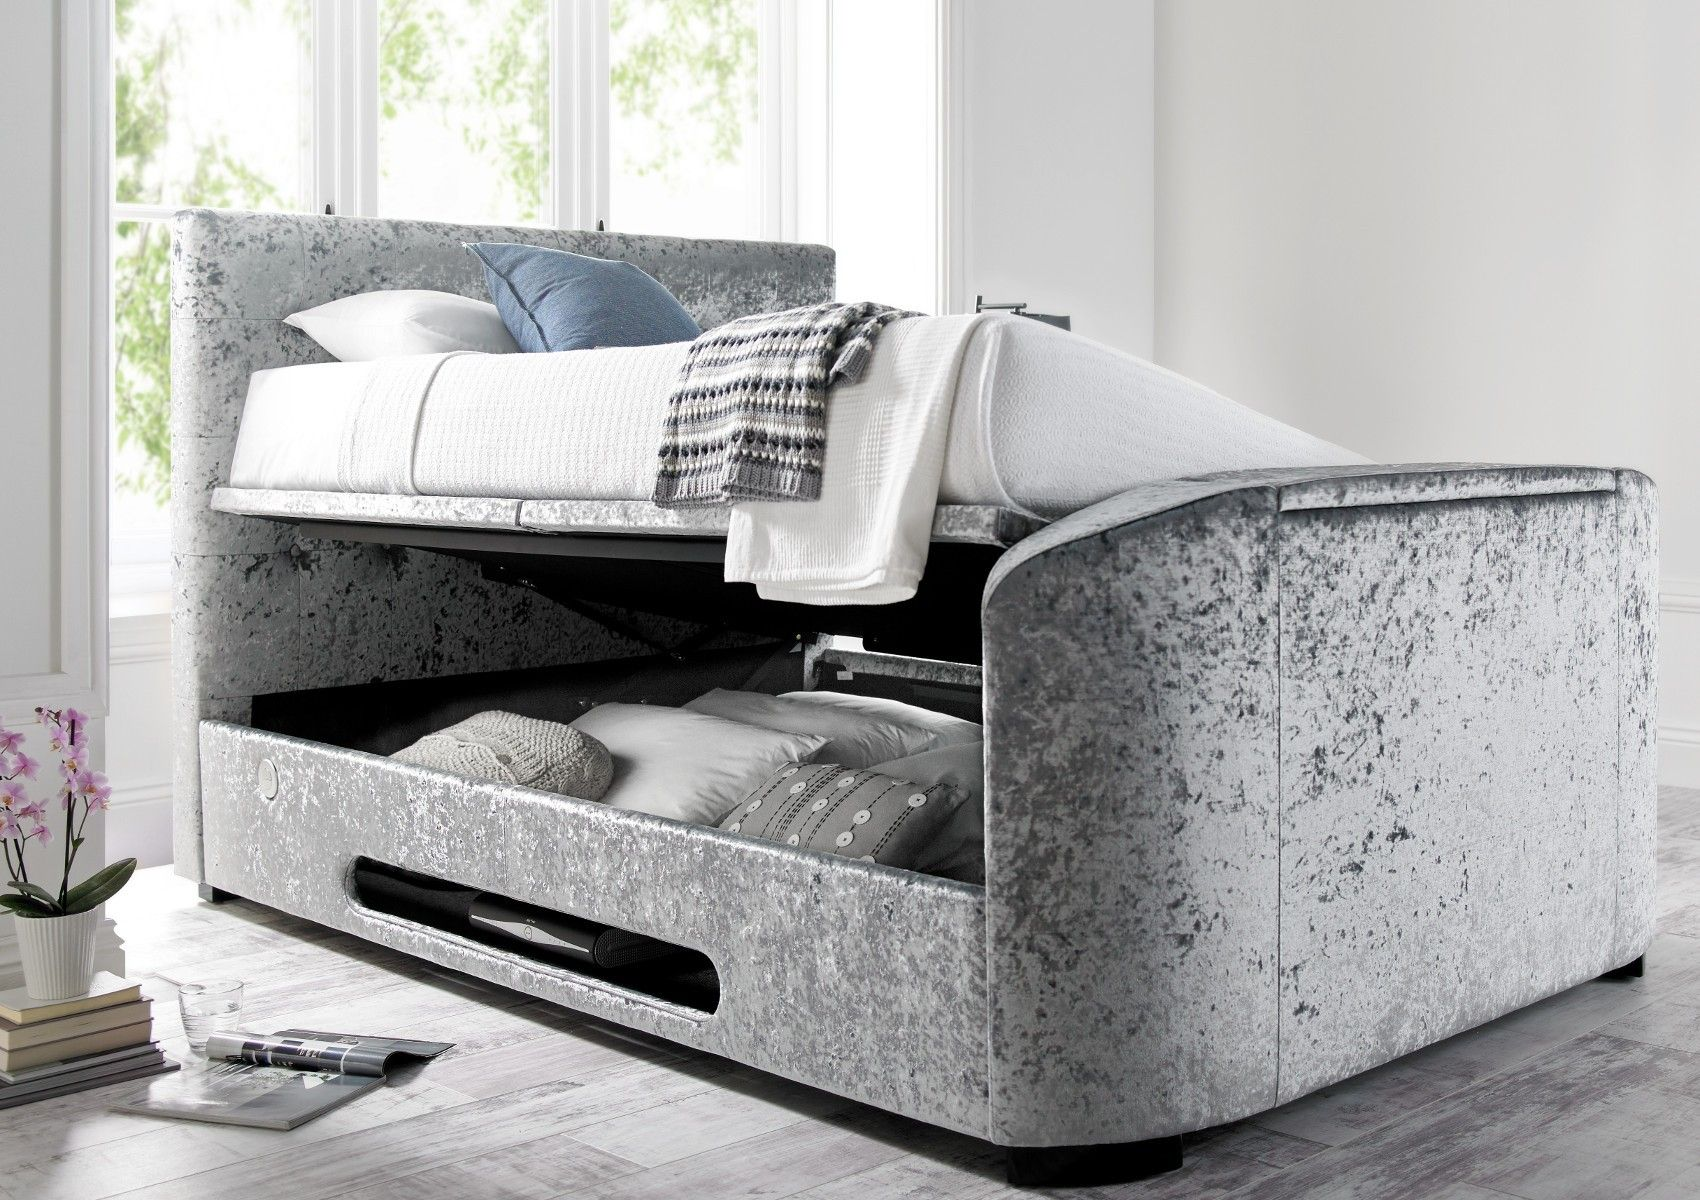 Kingston Upholstered Velvet Platinum Tv Bed Tv Beds Bed Sizes Bed